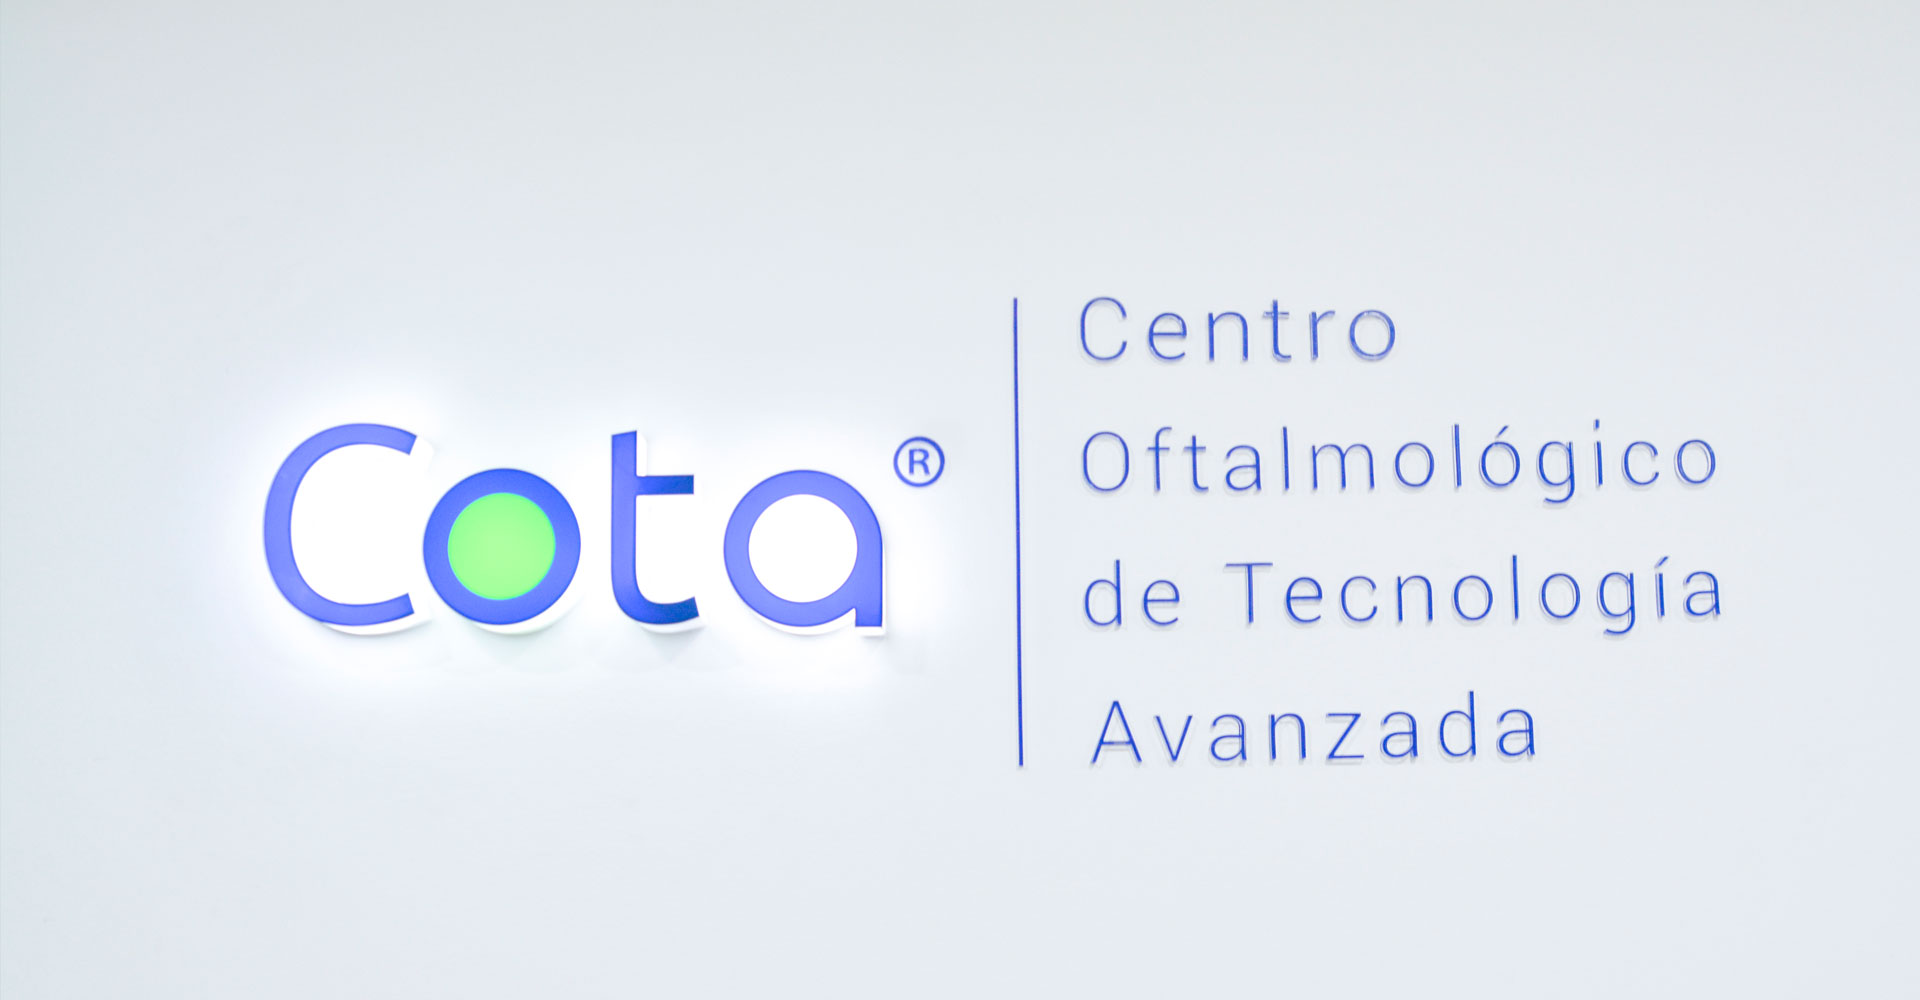 COTA Centro Oftalmologico de Tecnologia Avanzada